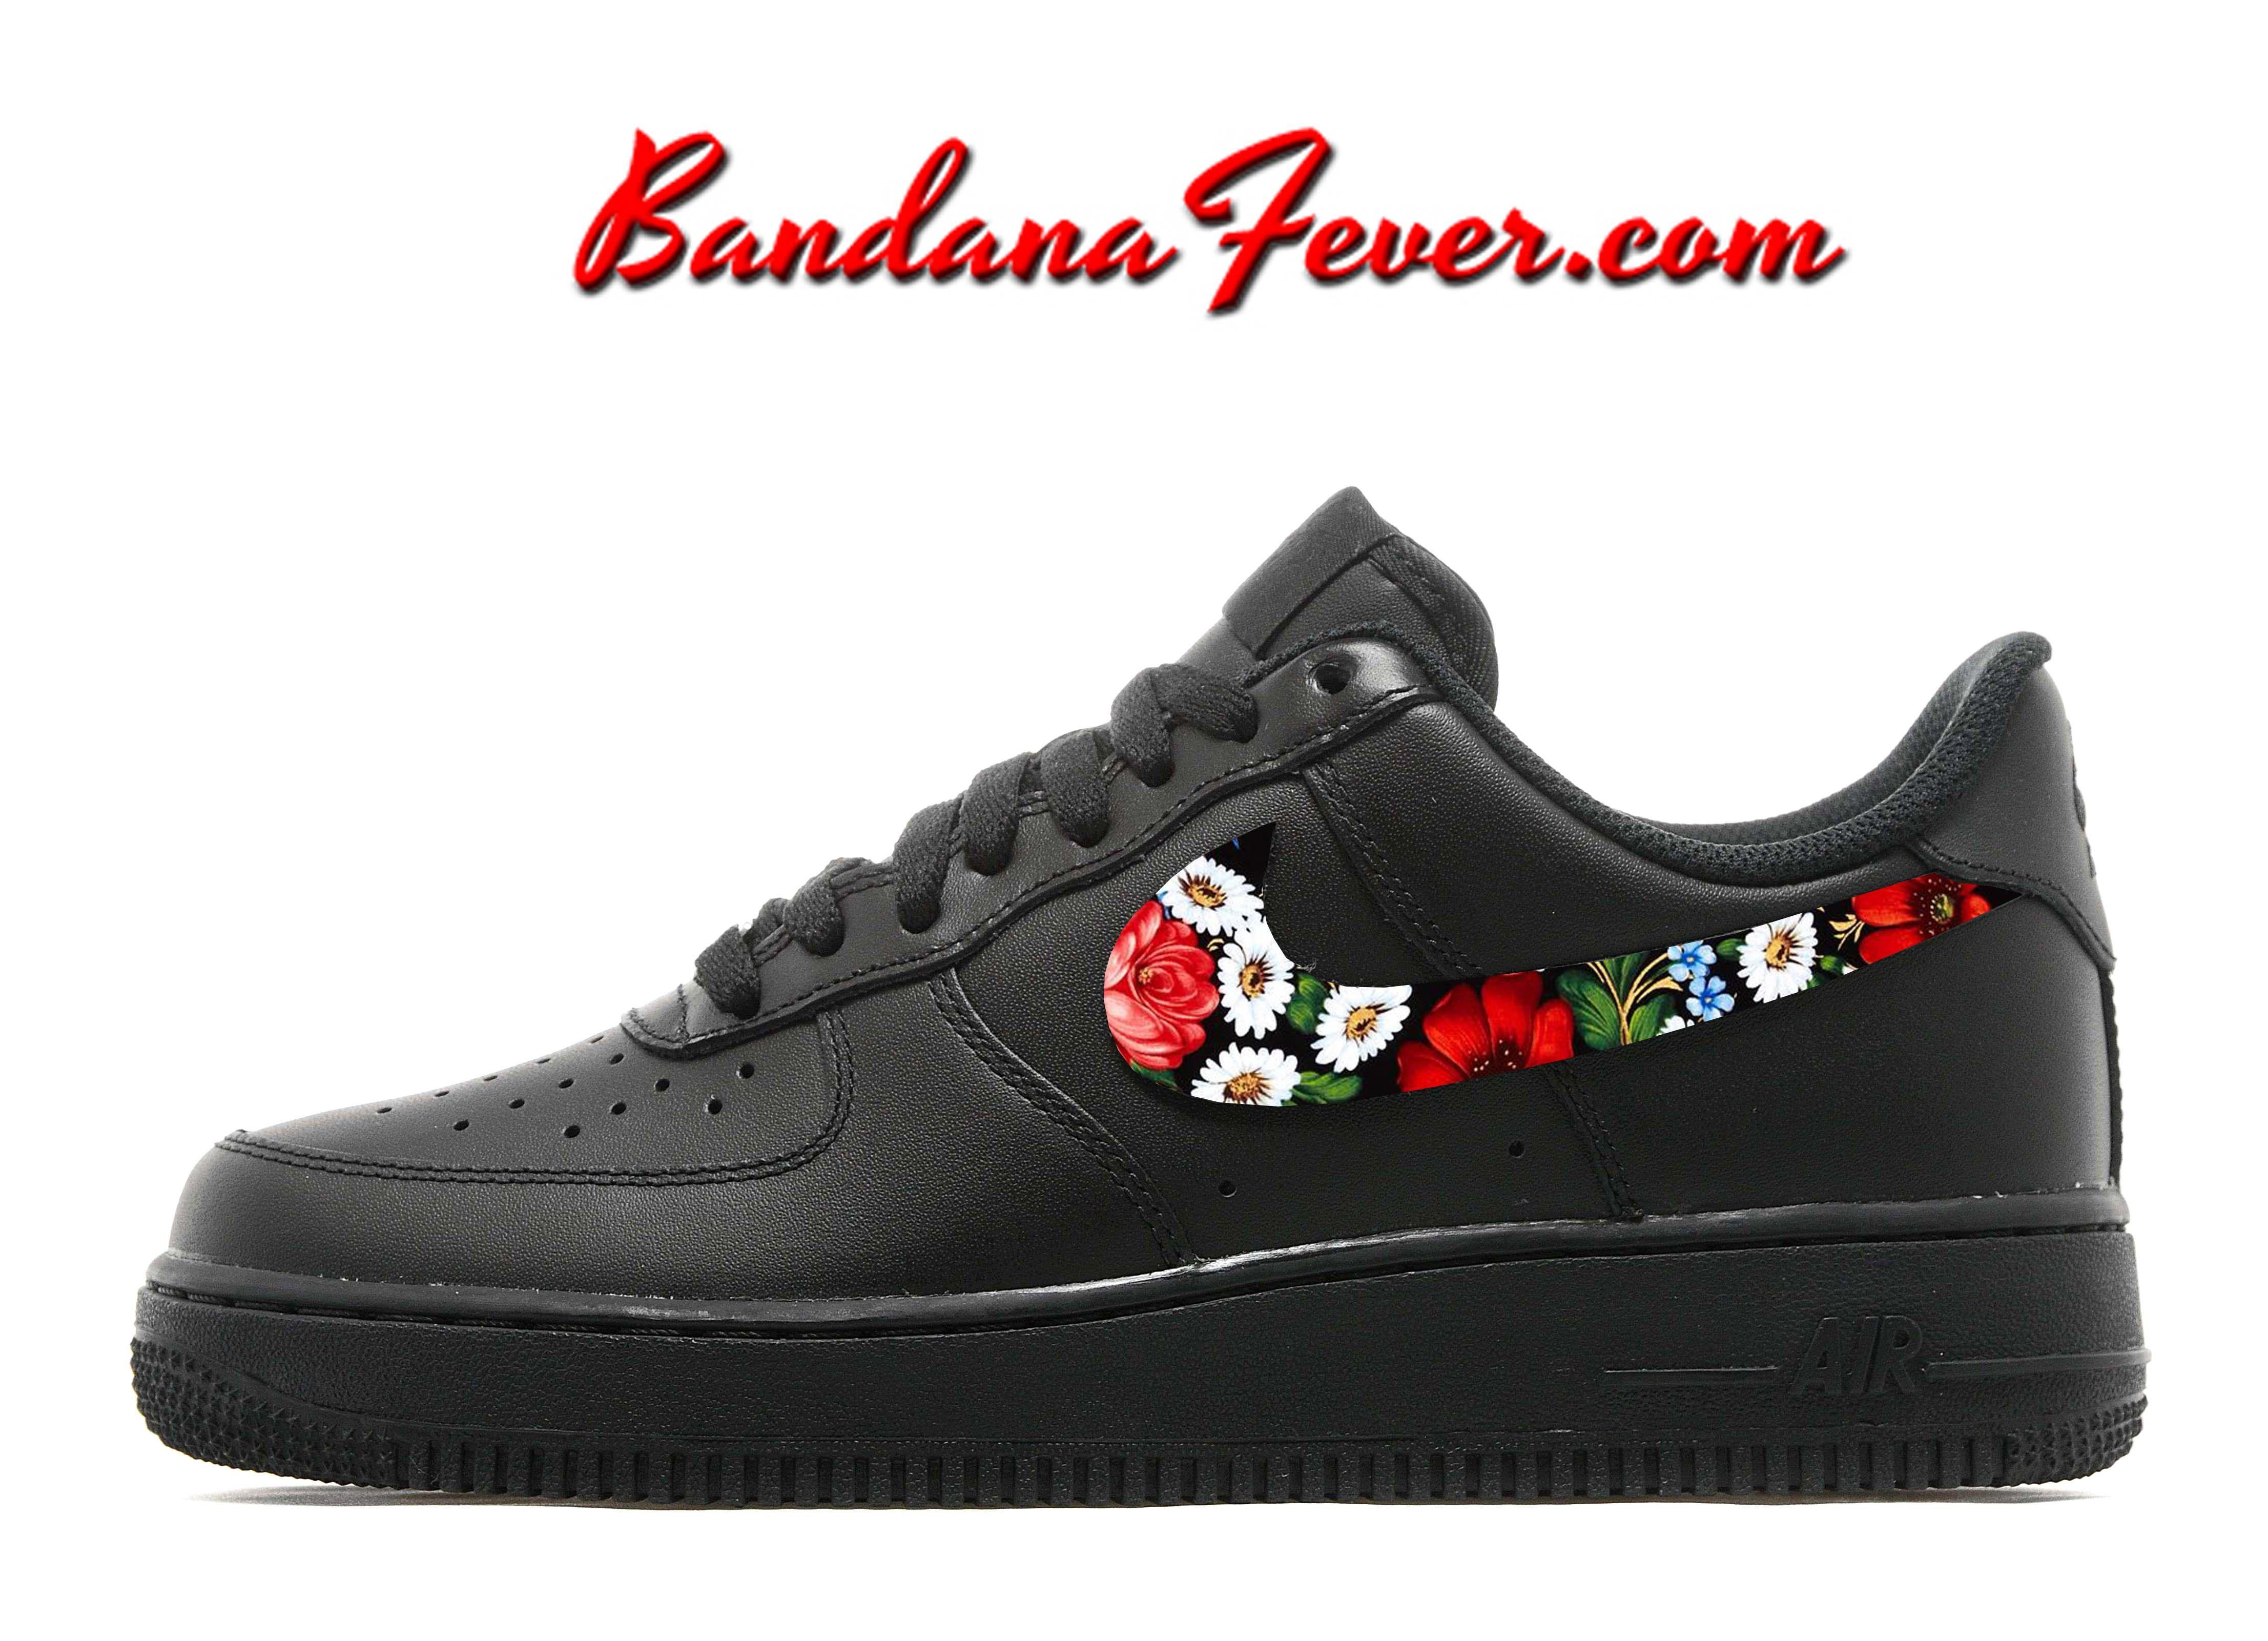 Bandana Fever | Custom Design Your Nike Shoes & Custom Converse Shoes